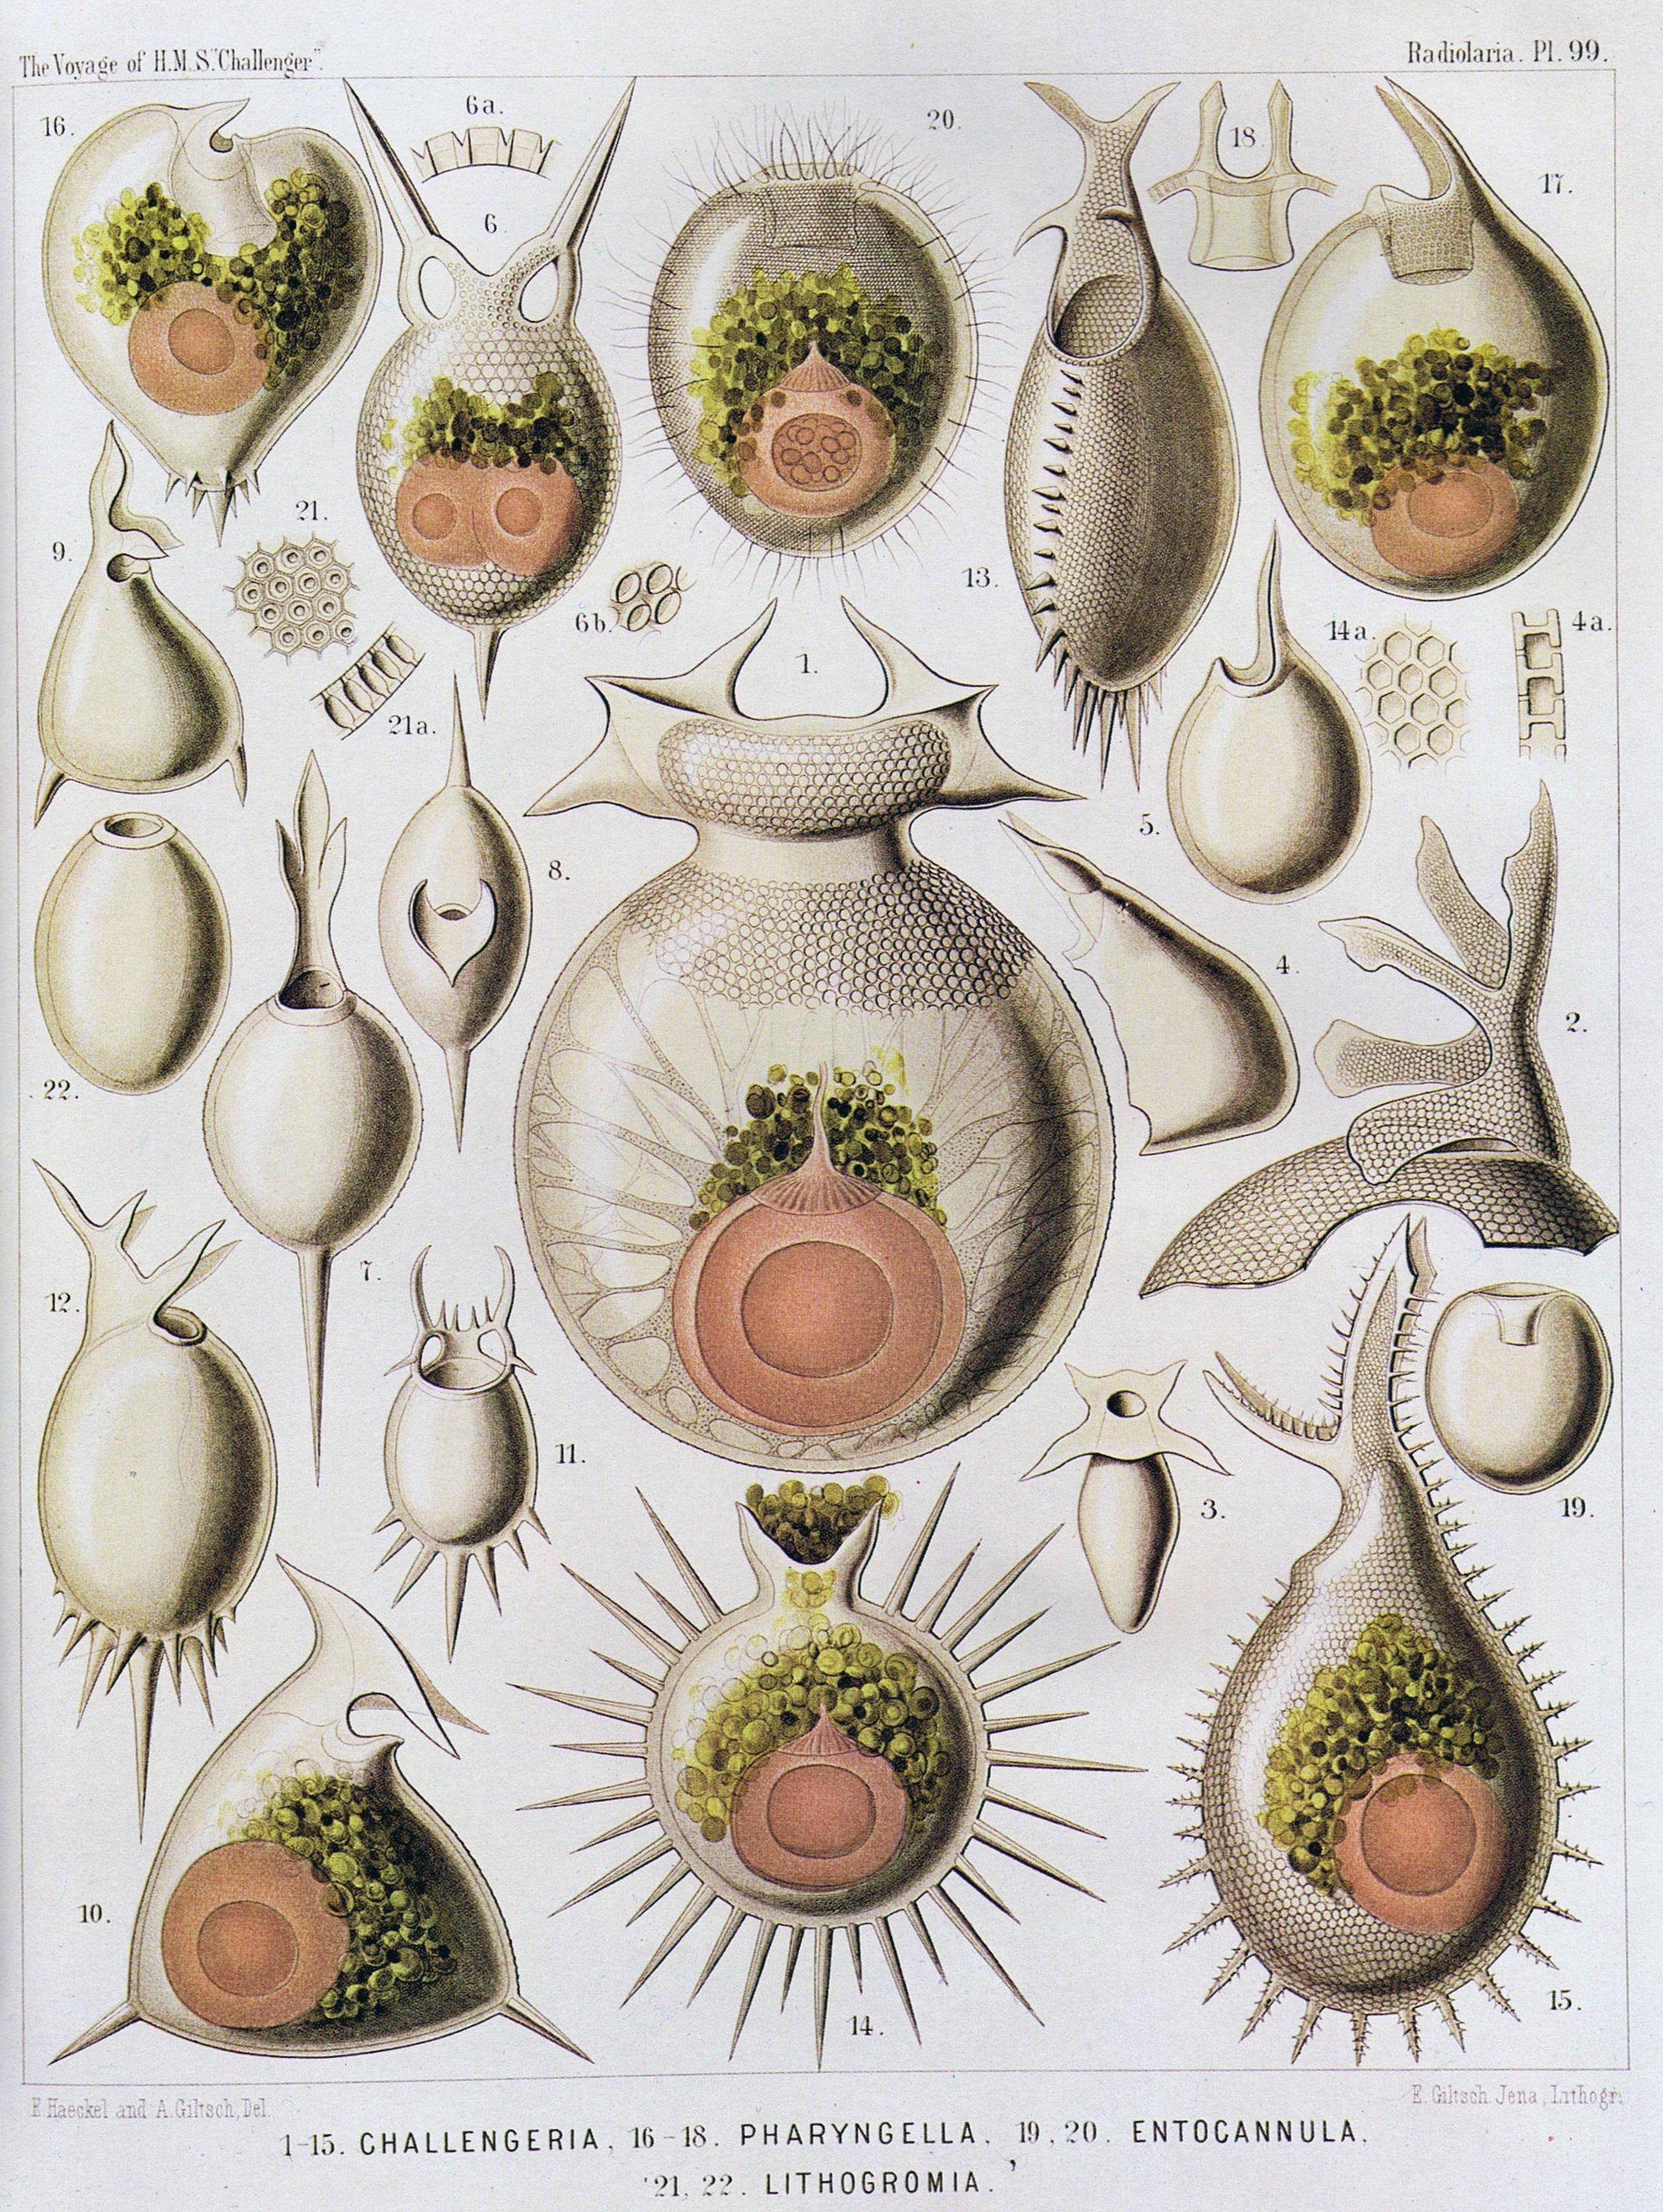 radiolaria wikipedia Slime Mold Diagram